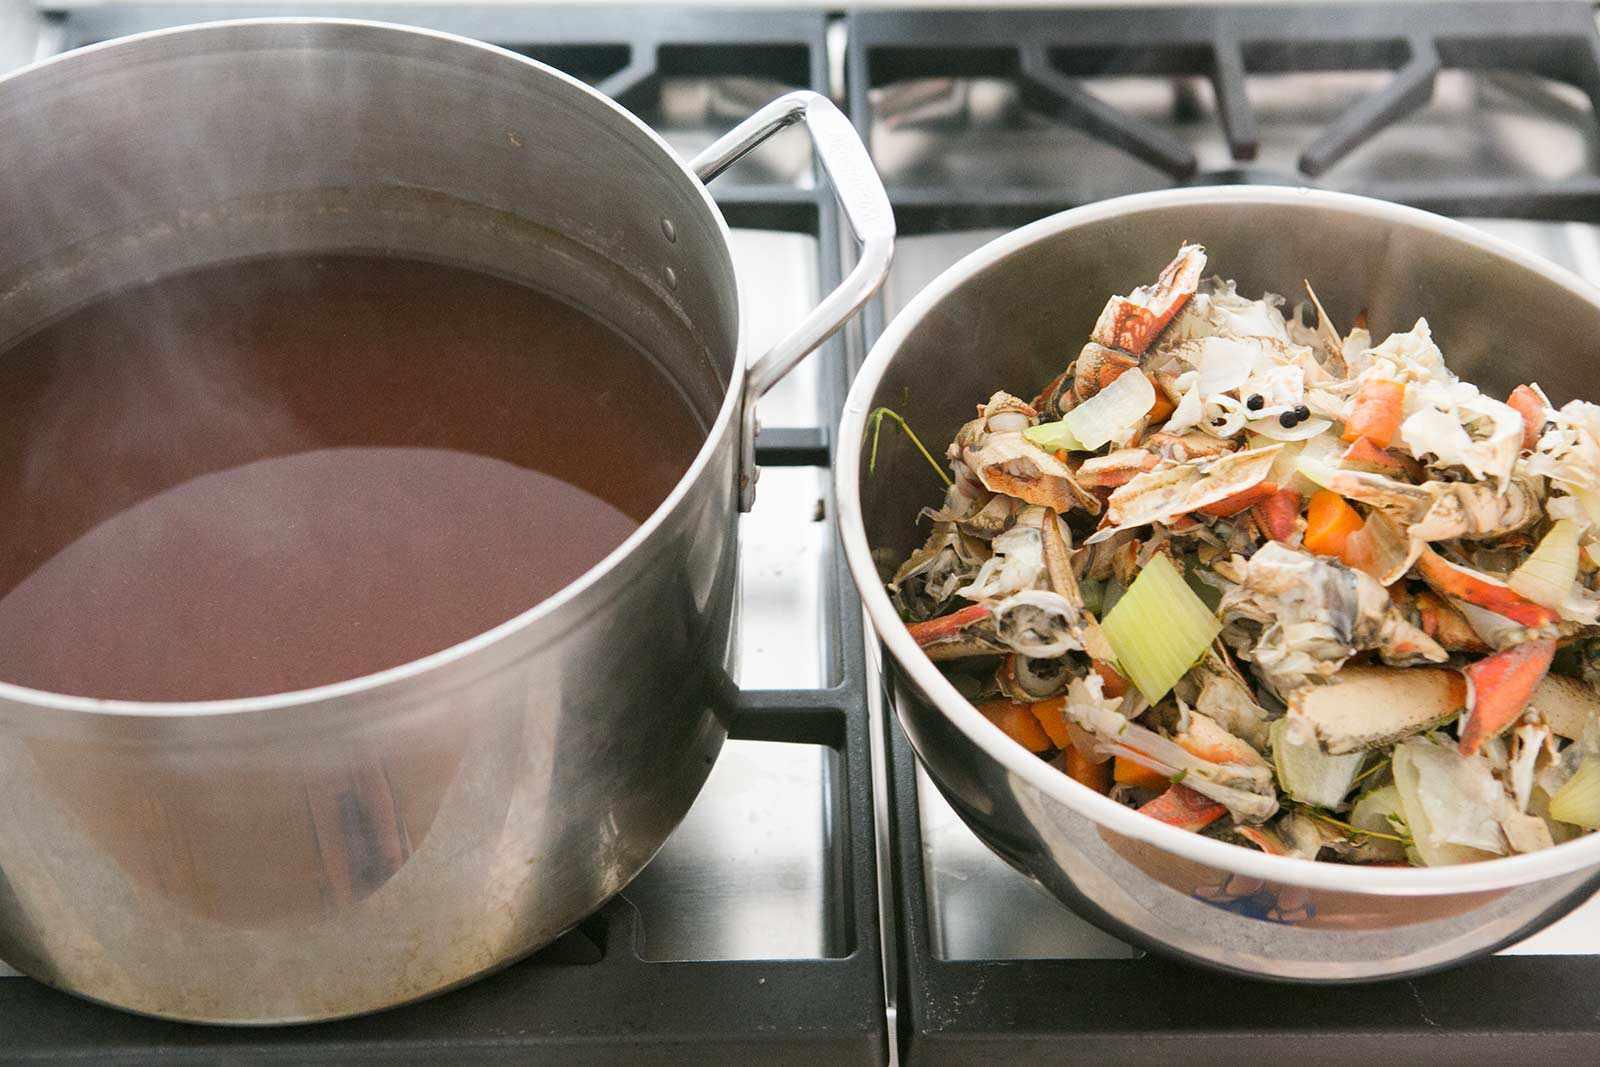 How to make shellfish stock